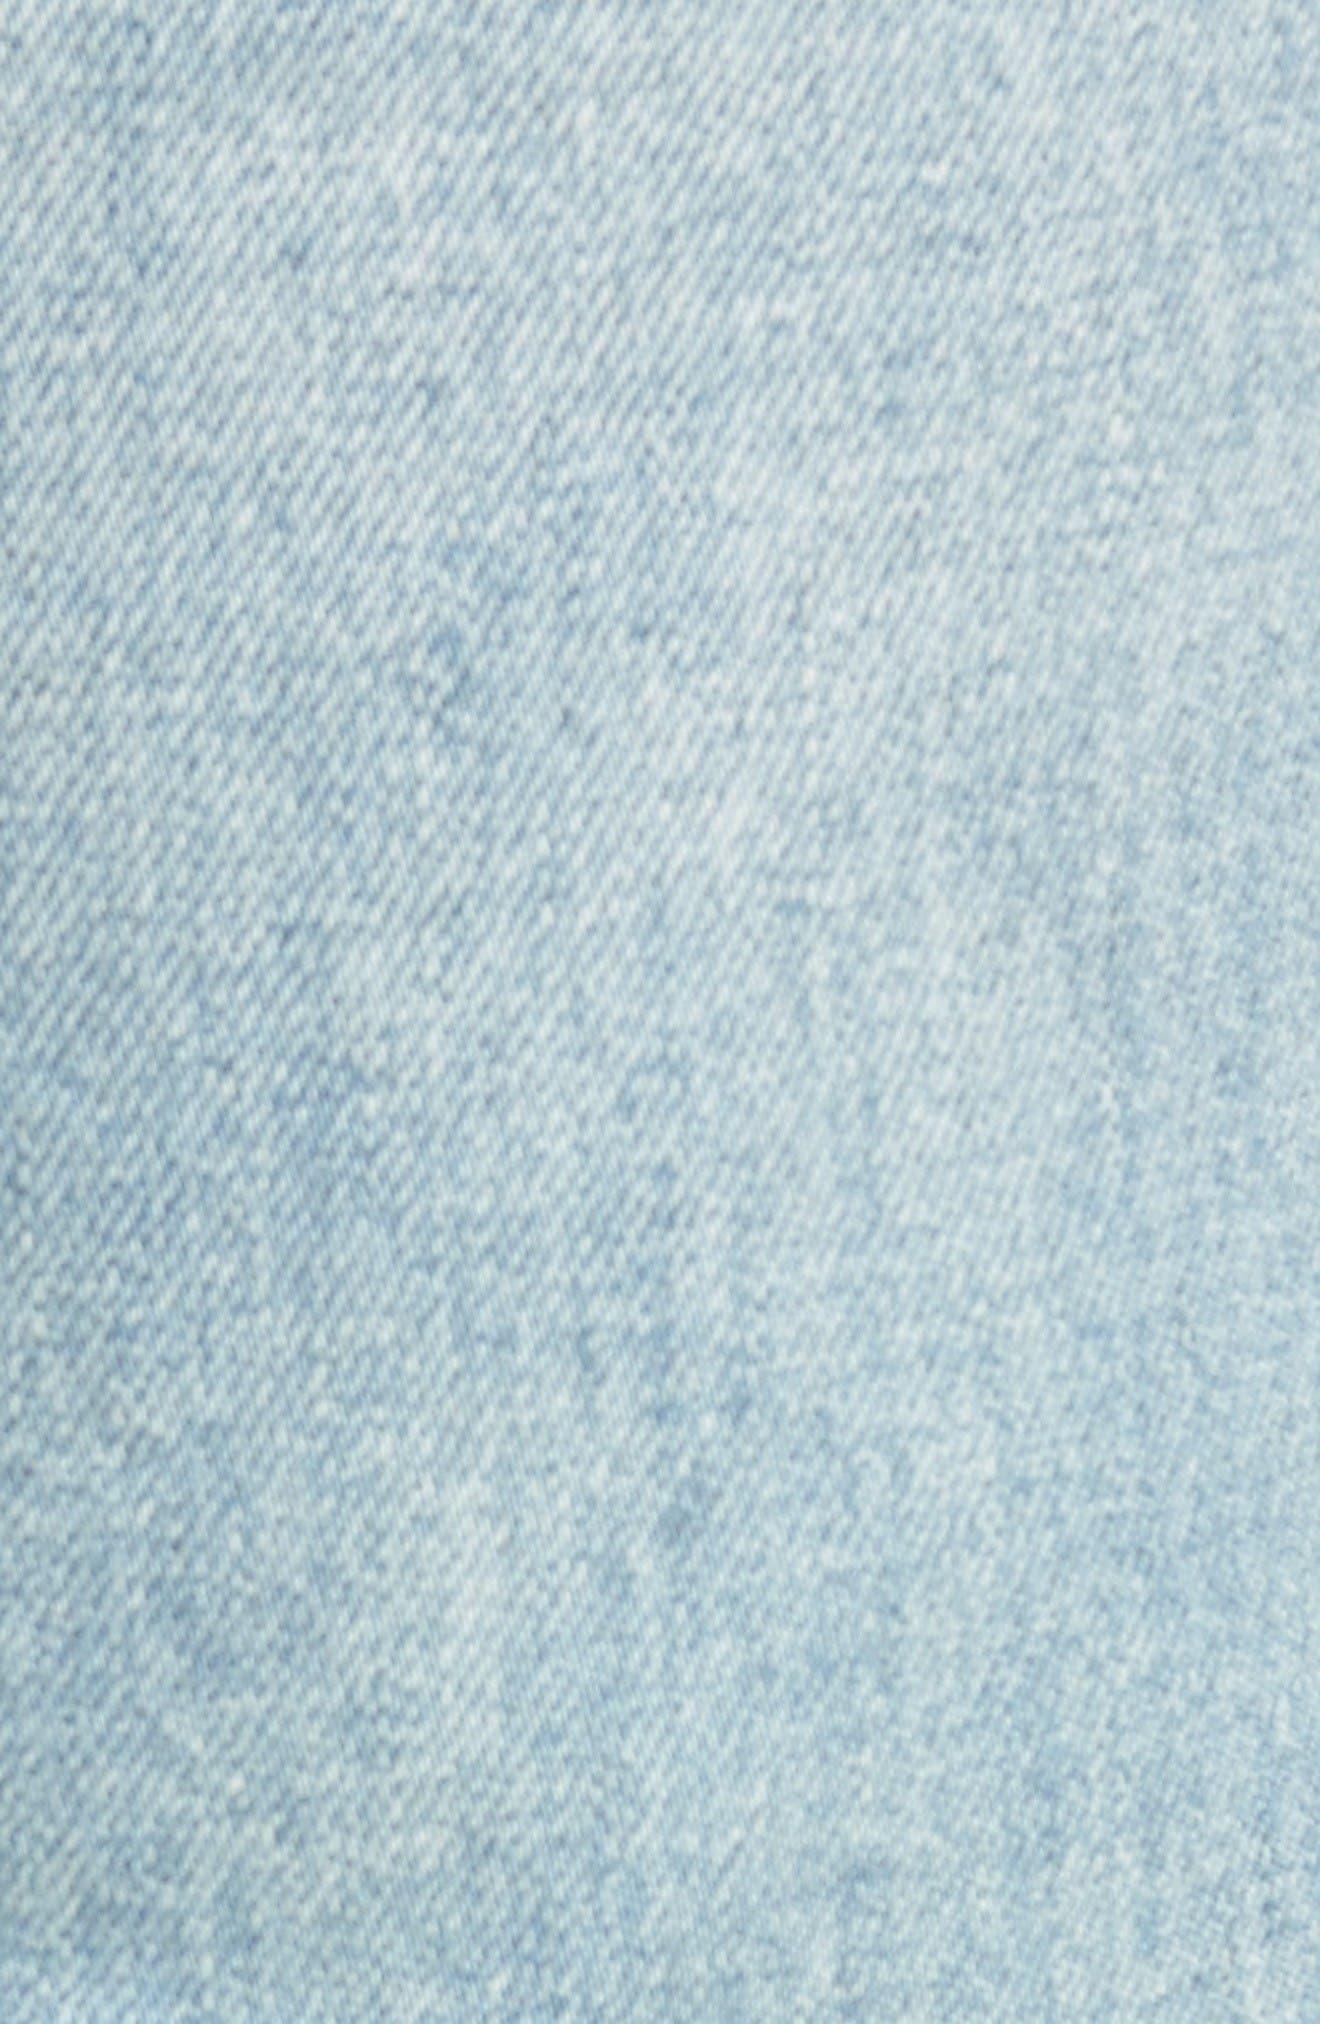 Castaway Slim Fit Jeans,                             Alternate thumbnail 5, color,                             Bleached Vintage Wash